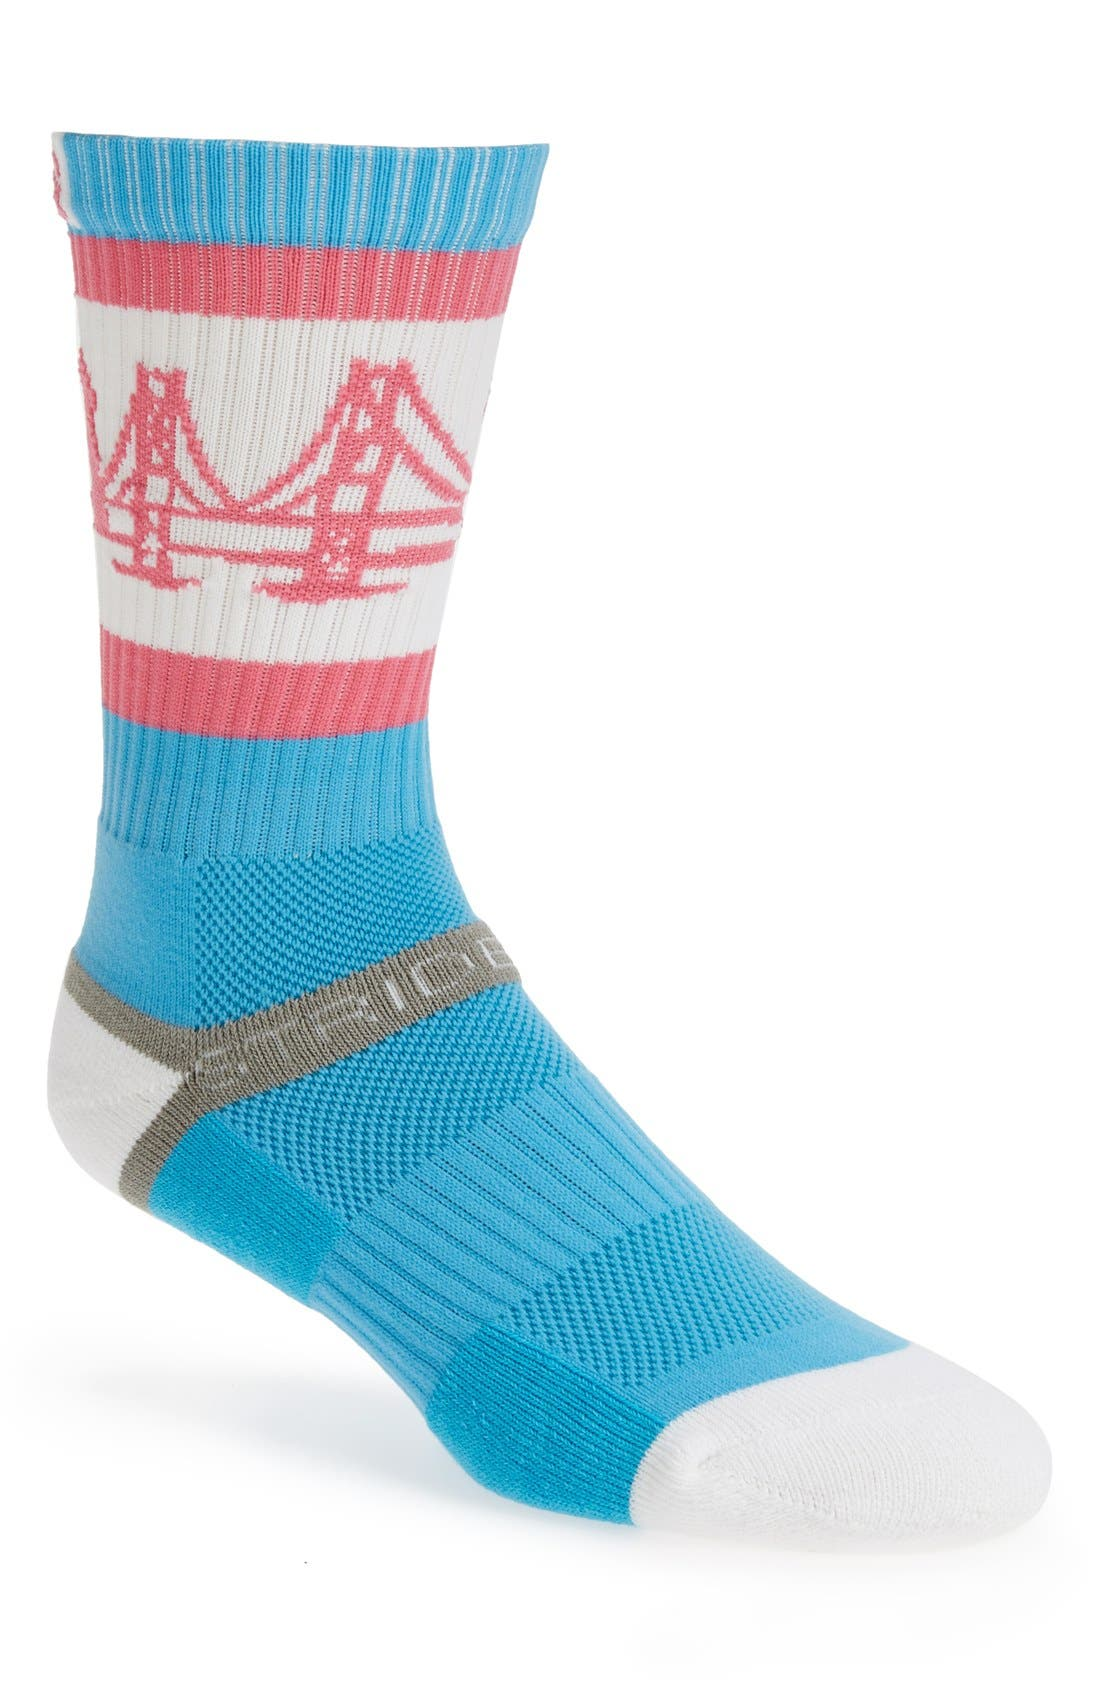 Alternate Image 1 Selected - STRIDELINE 'The Bay' Socks